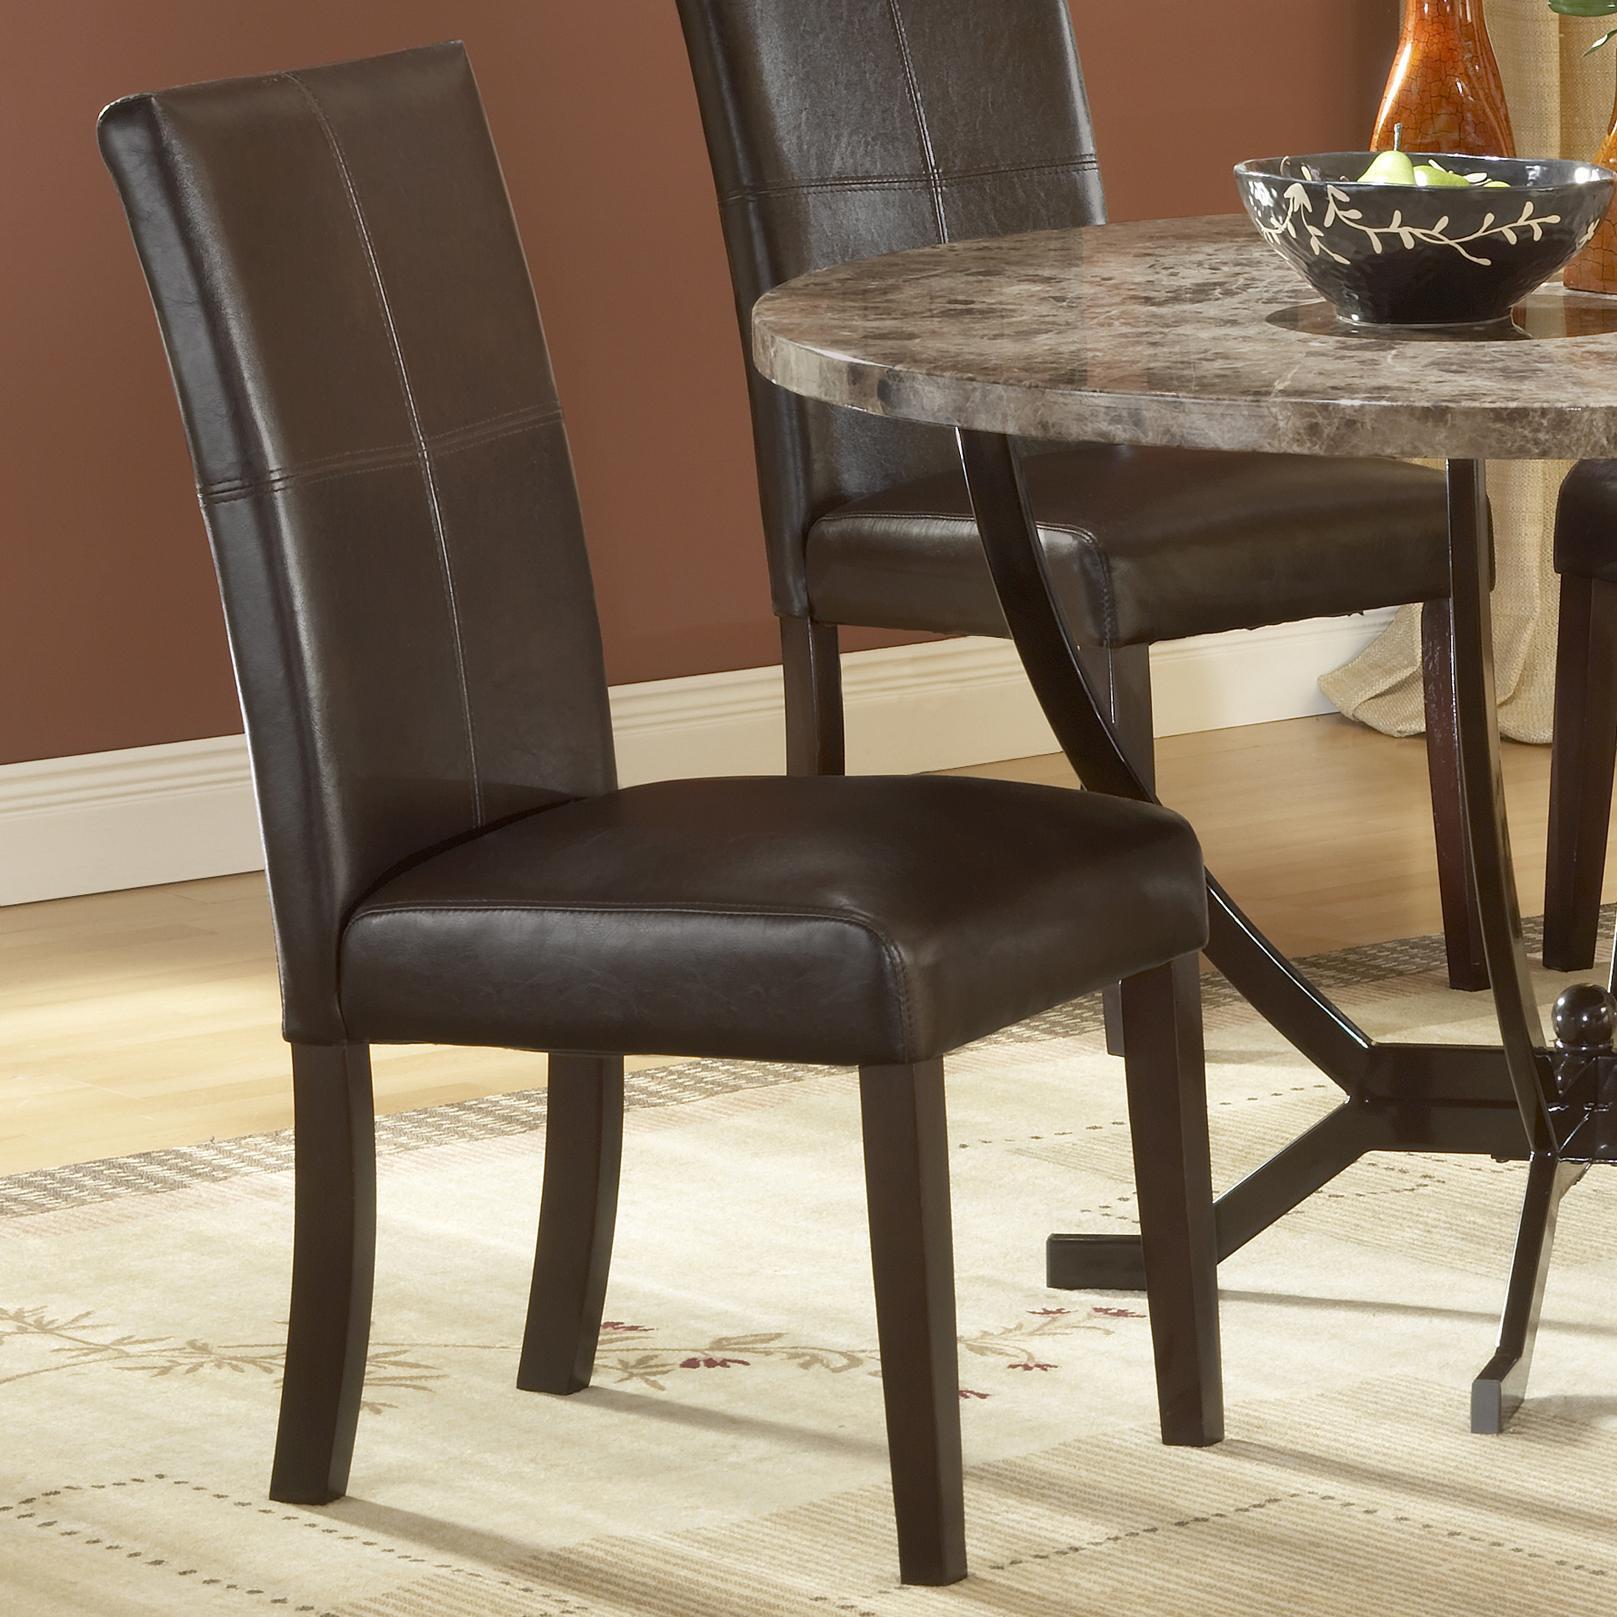 Hillsdale Monaco Side Parson Chair - Item Number: 4142-802